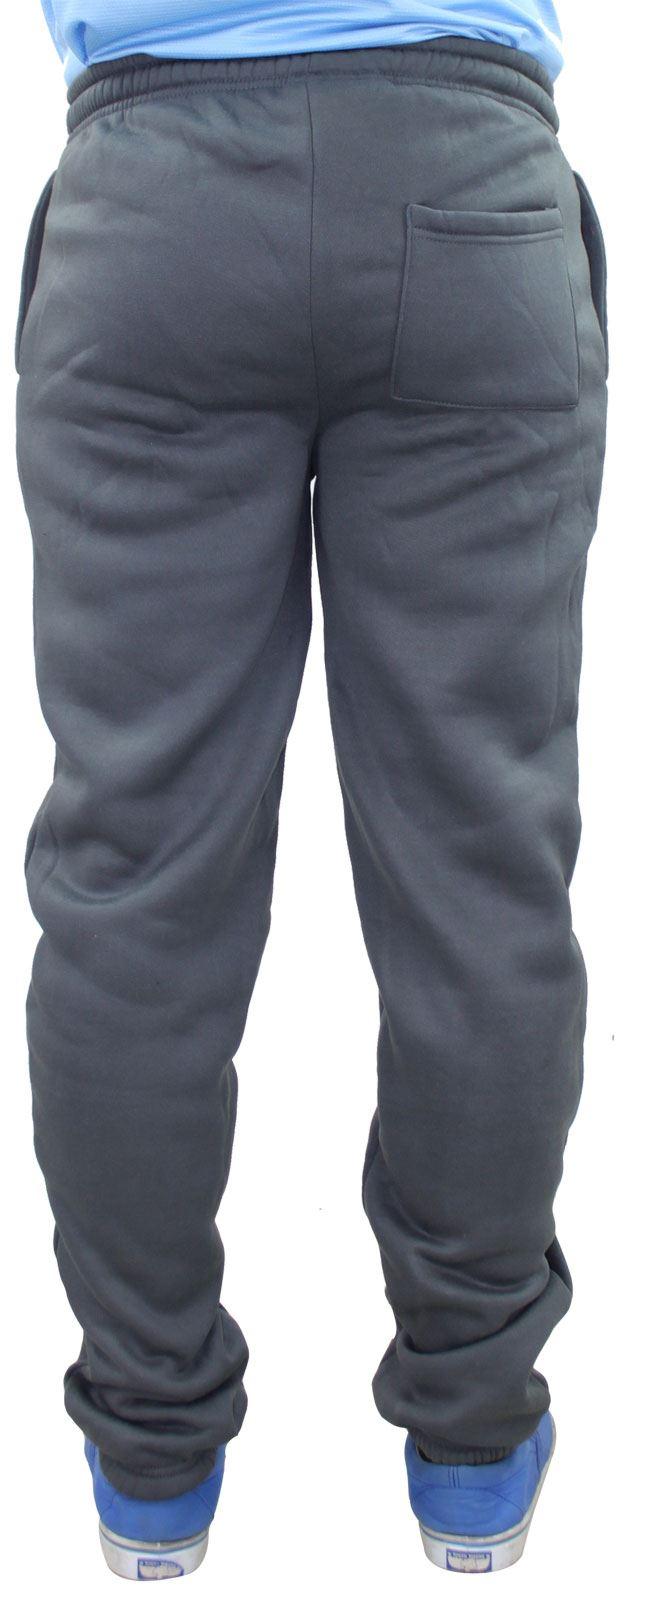 Mens-Women-Plain-Fleece-Joggers-Bottoms-Jogging-Pant-Gym-Fitness-Sports-Trousers thumbnail 5